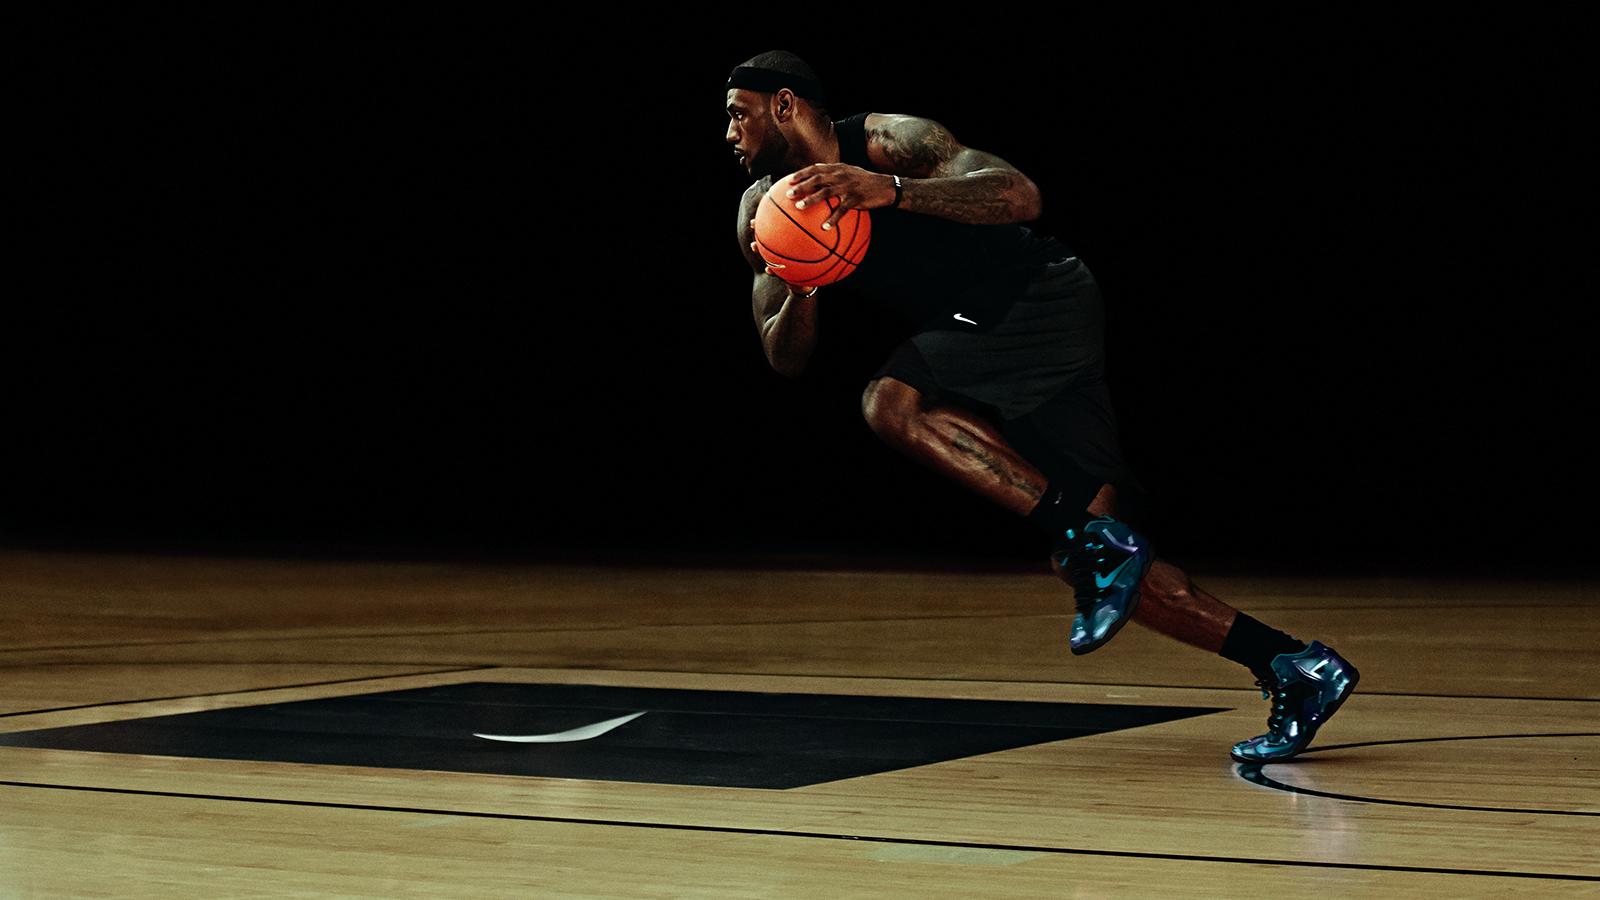 Basketball Nike Shoes Air Wallpaper Image Wallpaper 1600x900